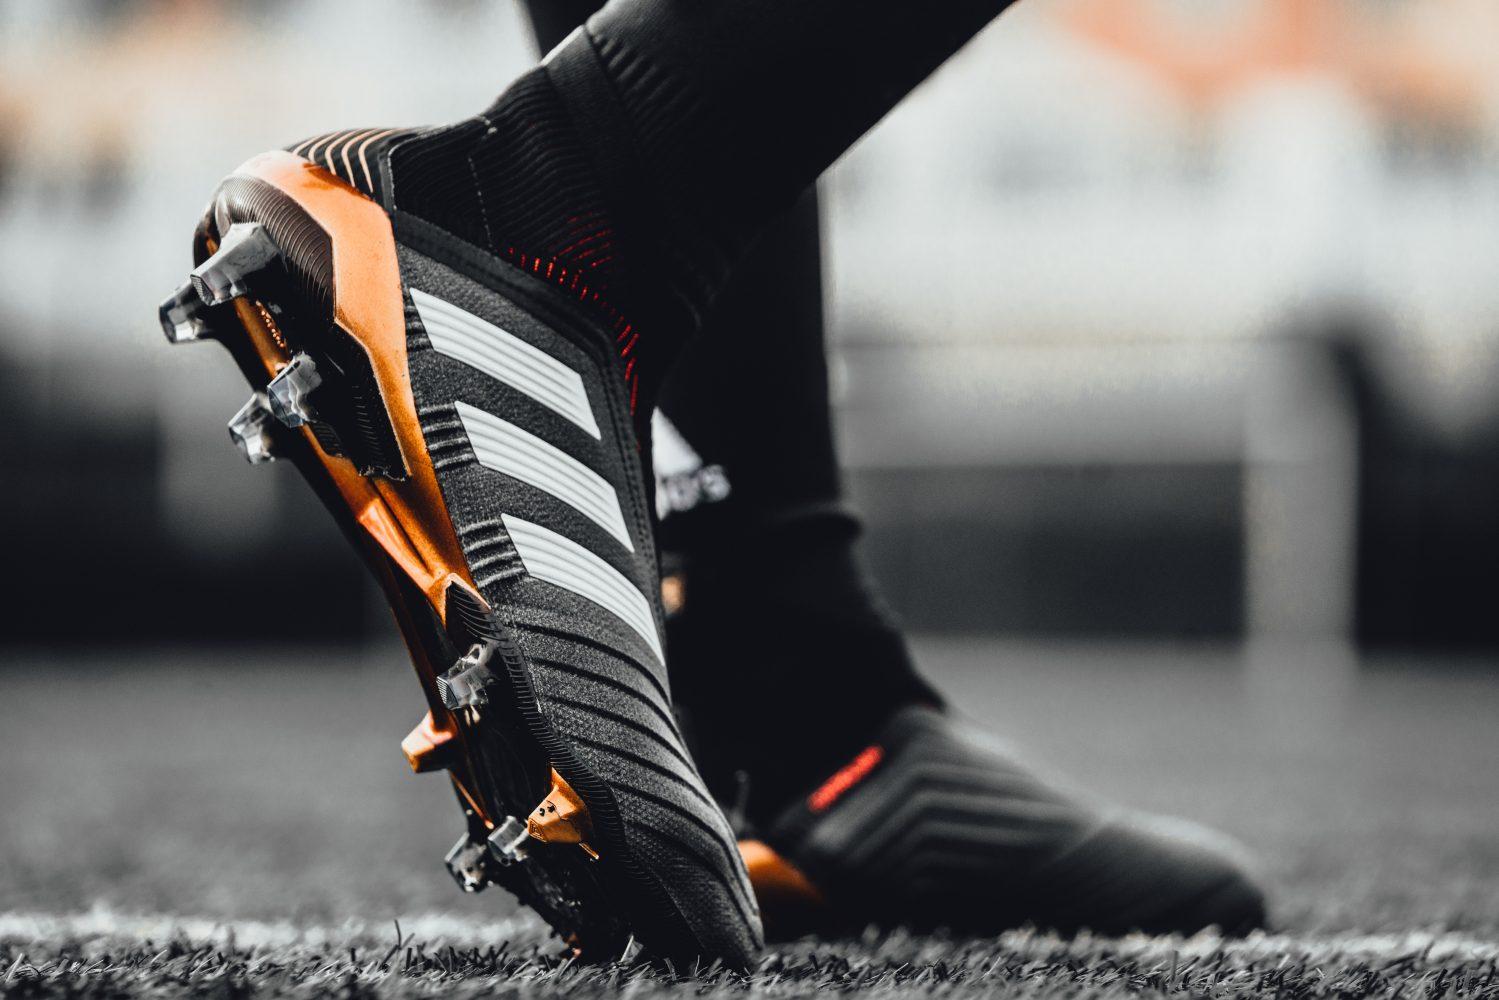 1823611b3f1b Introducing the adidas Predator 18+ - SoccerNation